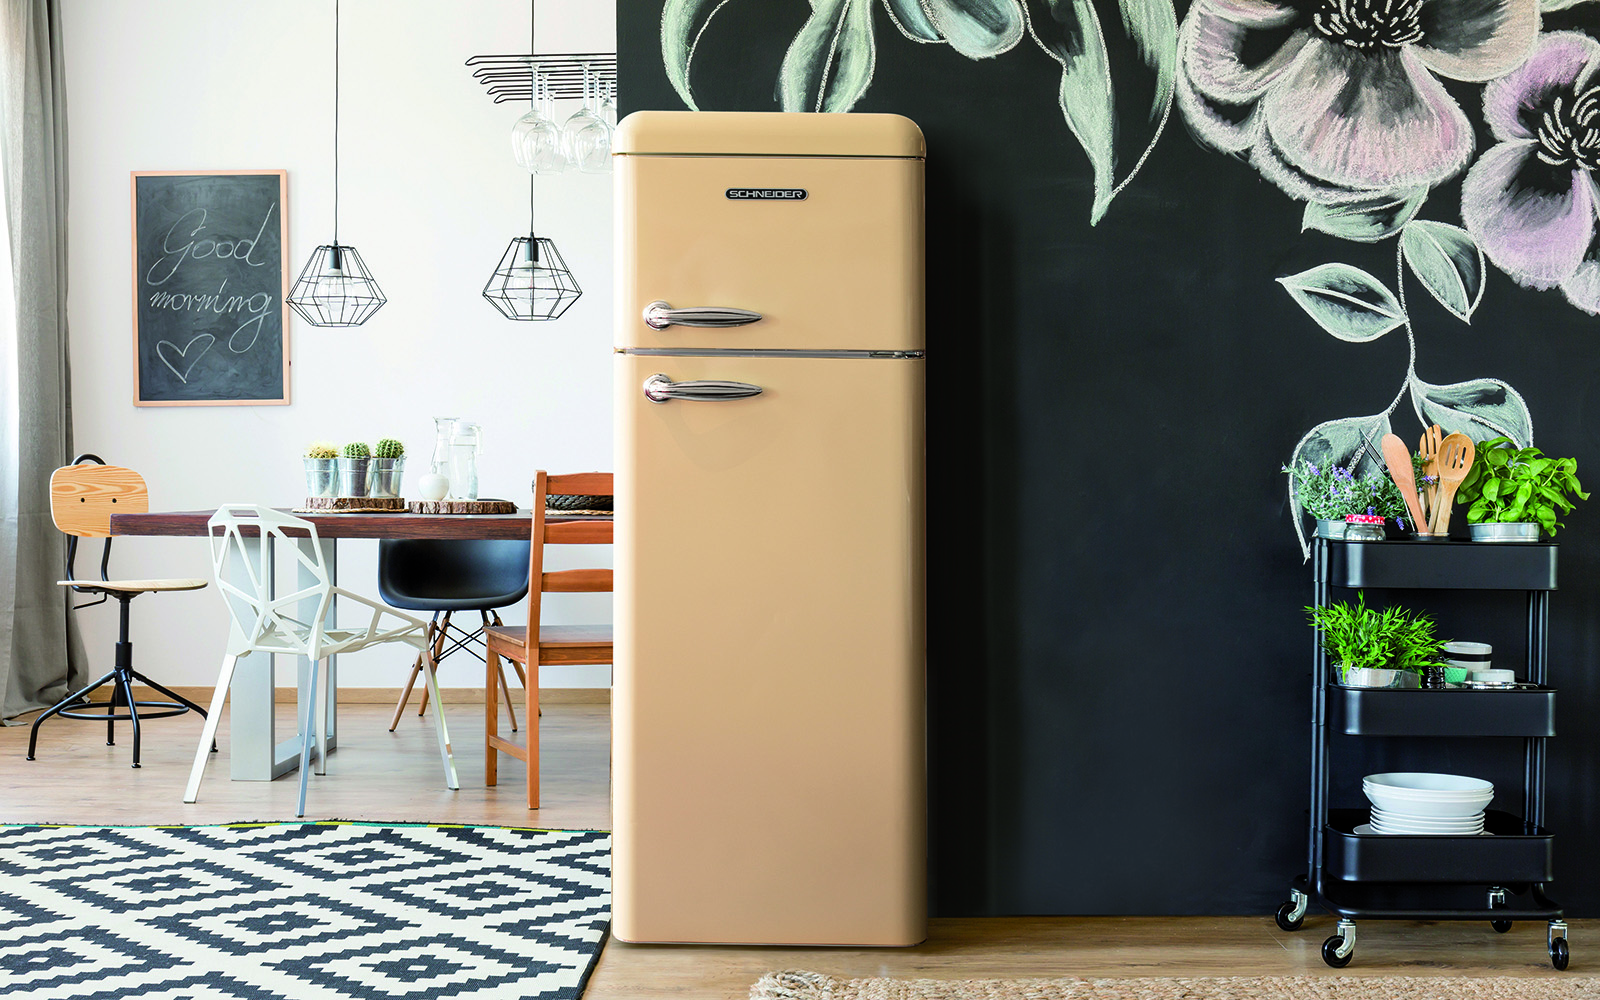 Retro Design Keuken : Schneider kleurrijke keuken the art of living be